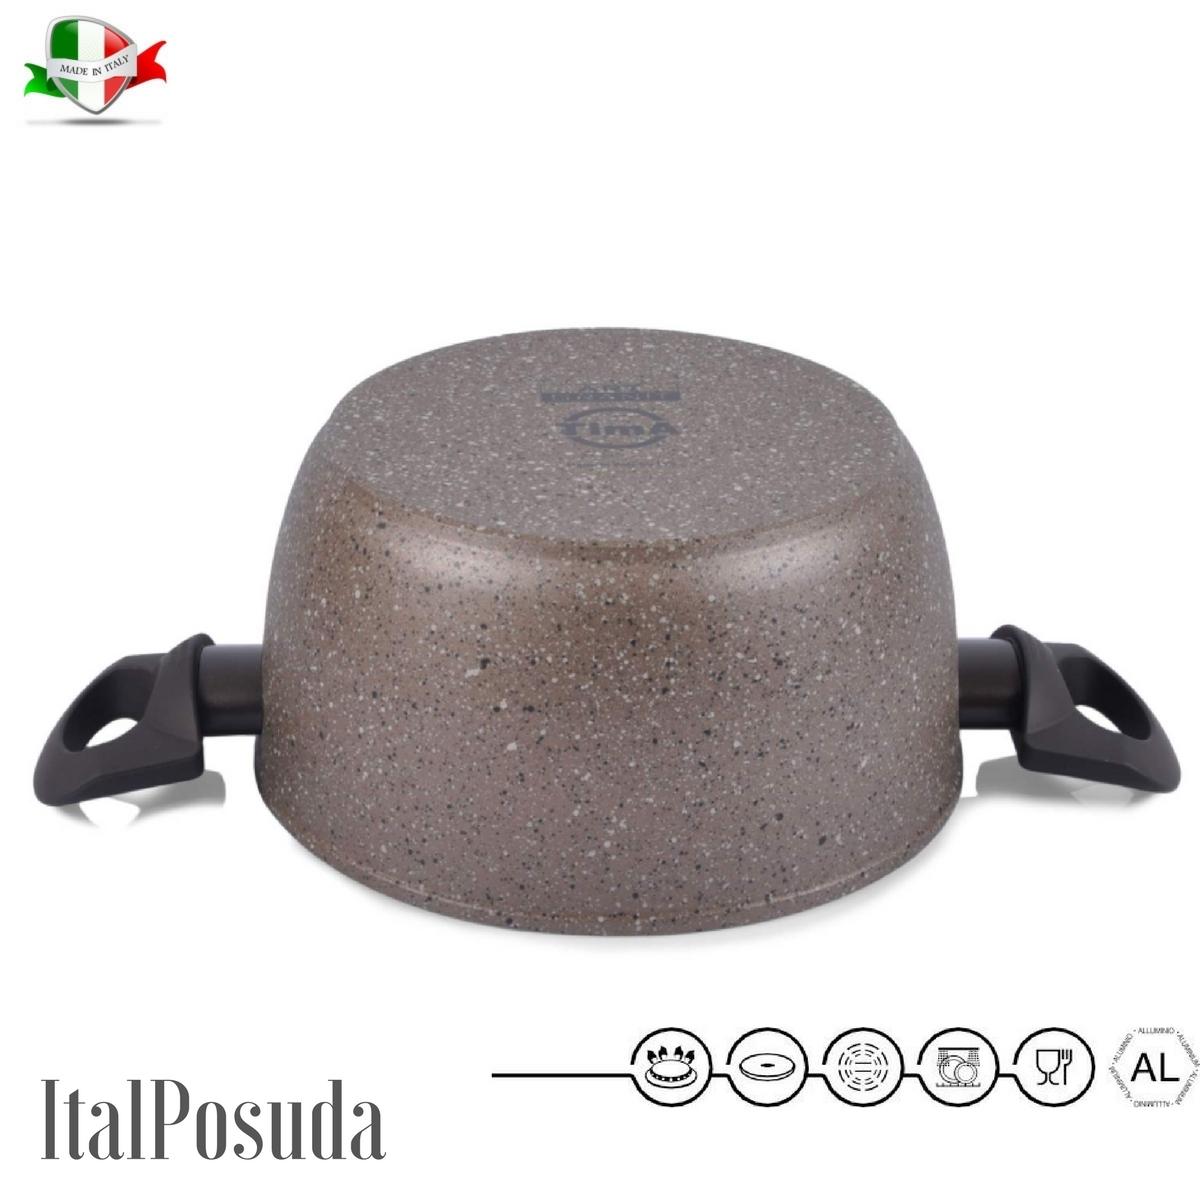 www.ital-posuda.ru. Кастрюля TIMA Art Granit индукционная 20 см /2,5 литра